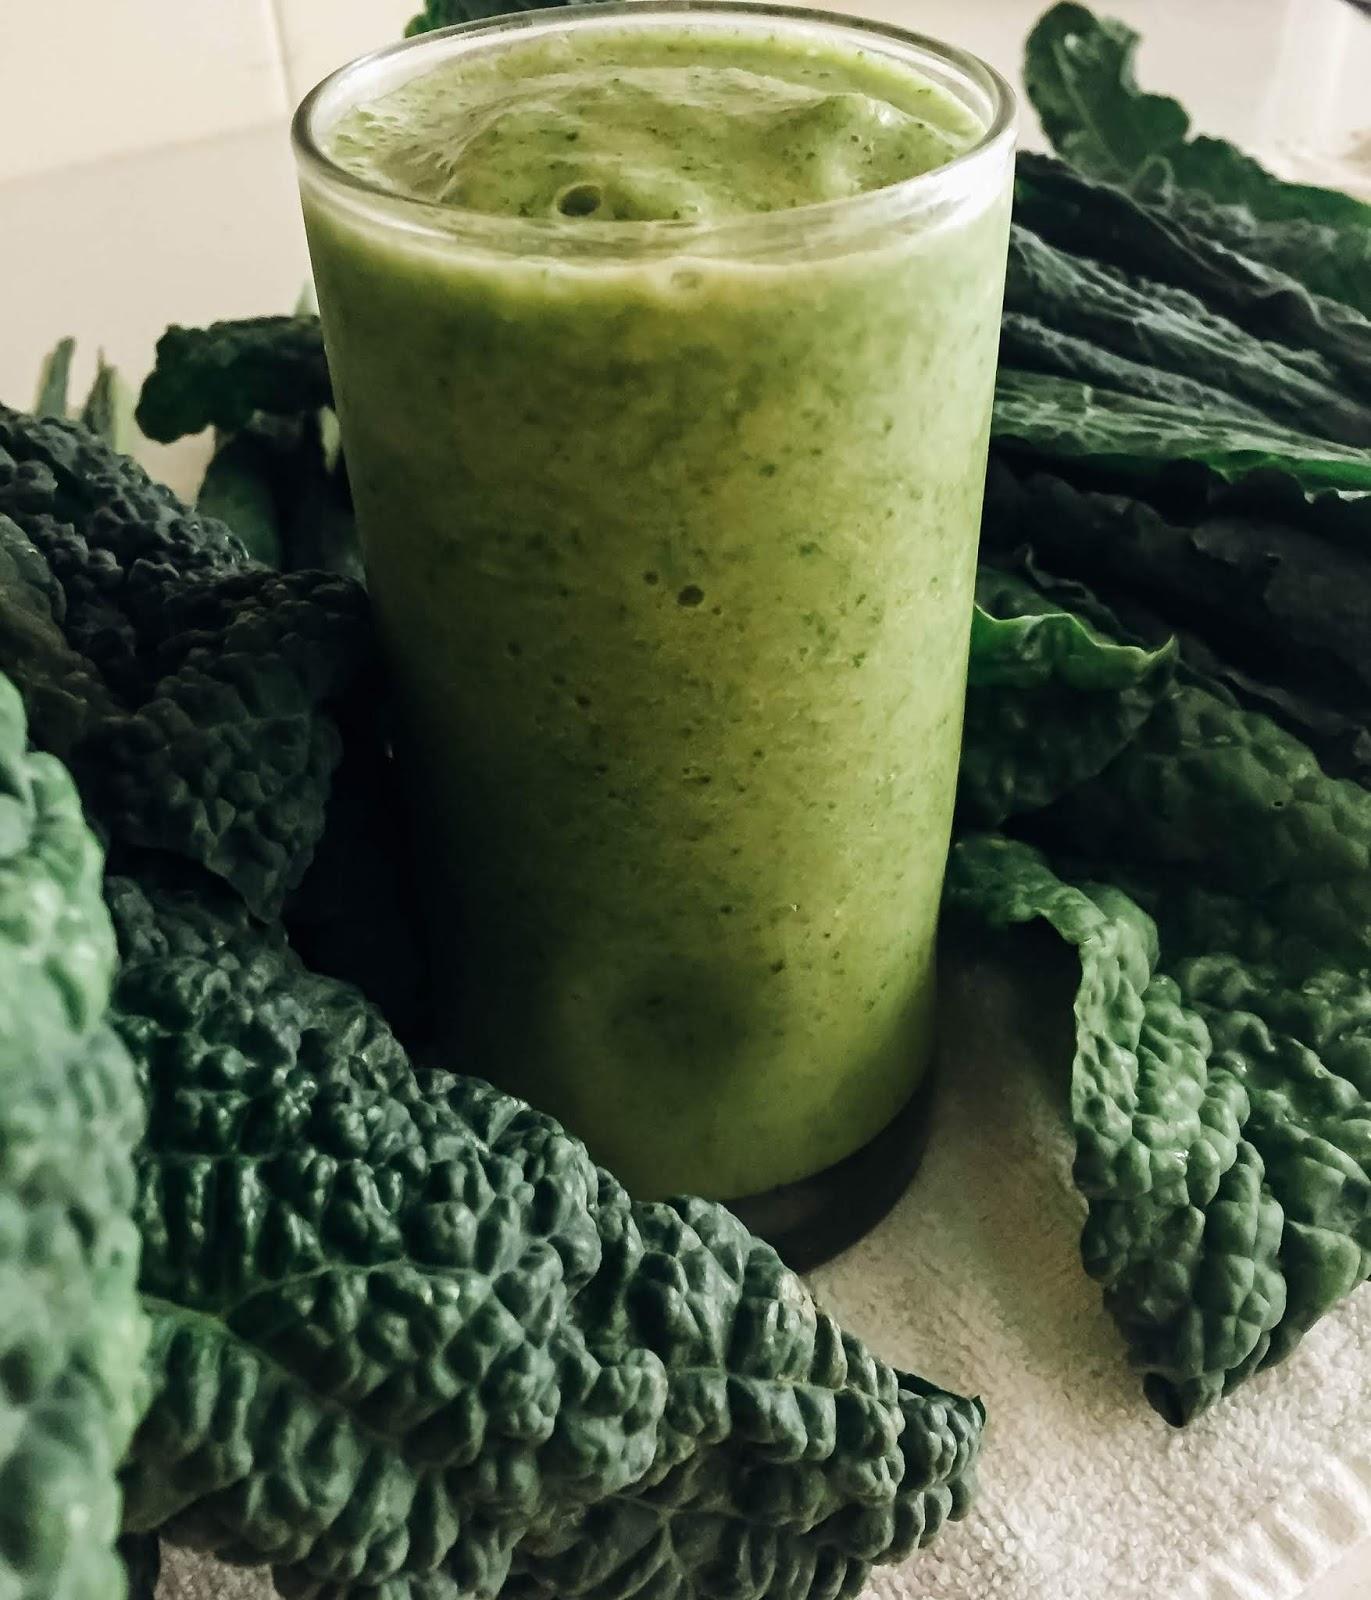 Easy Tropical Kale Smoothie recipe